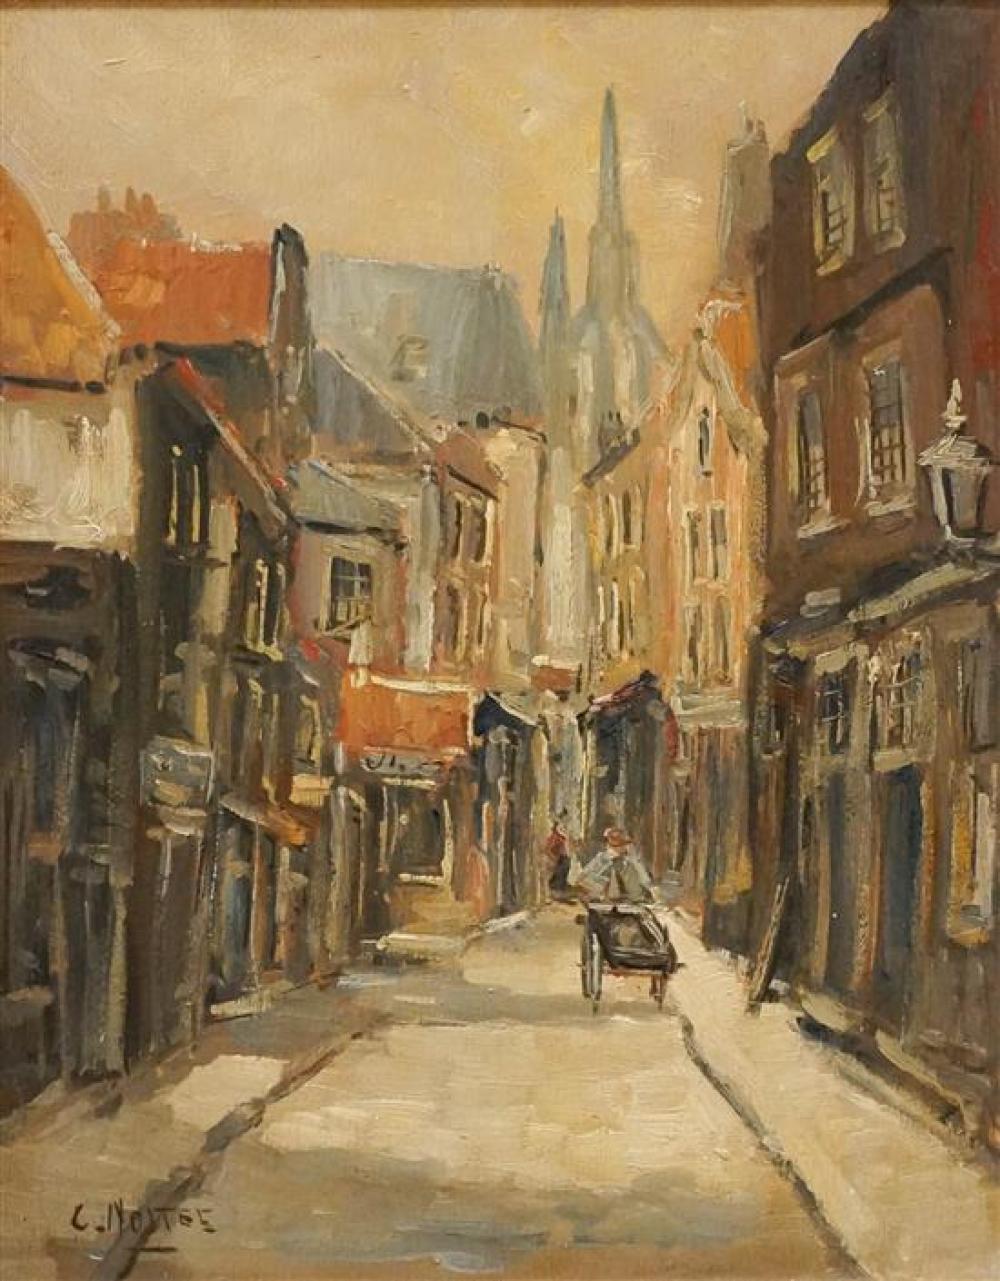 Bernardus Cornelis Noltee (Dutch 1903-1967), Flemish Street Scene, Oil on Panel, 20 x 16 in